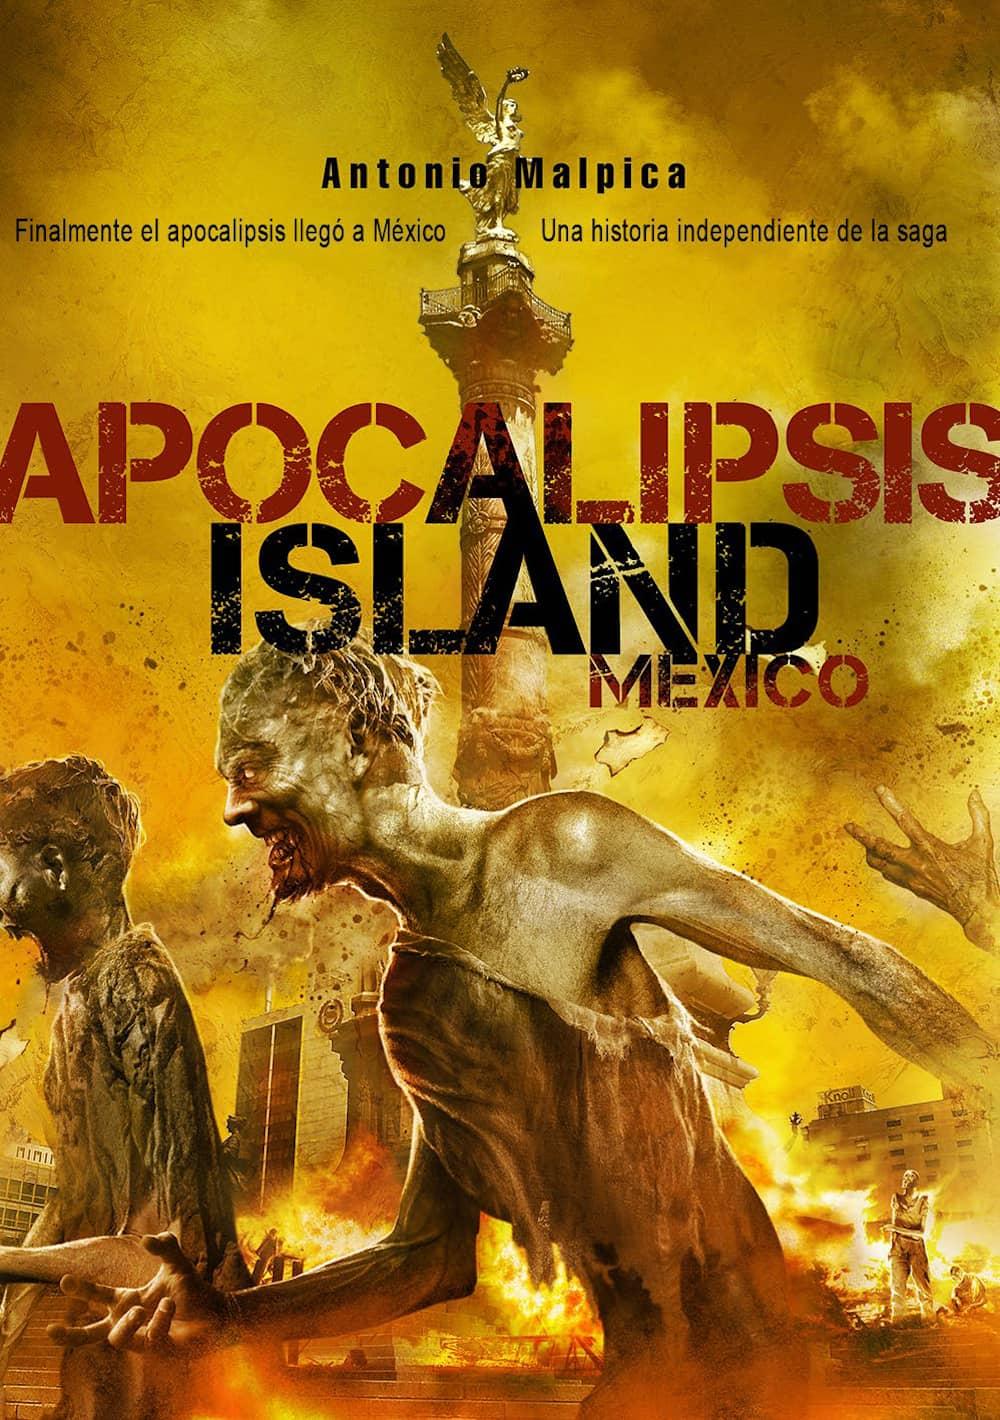 APOCALIPSIS ISLAND MEXICO